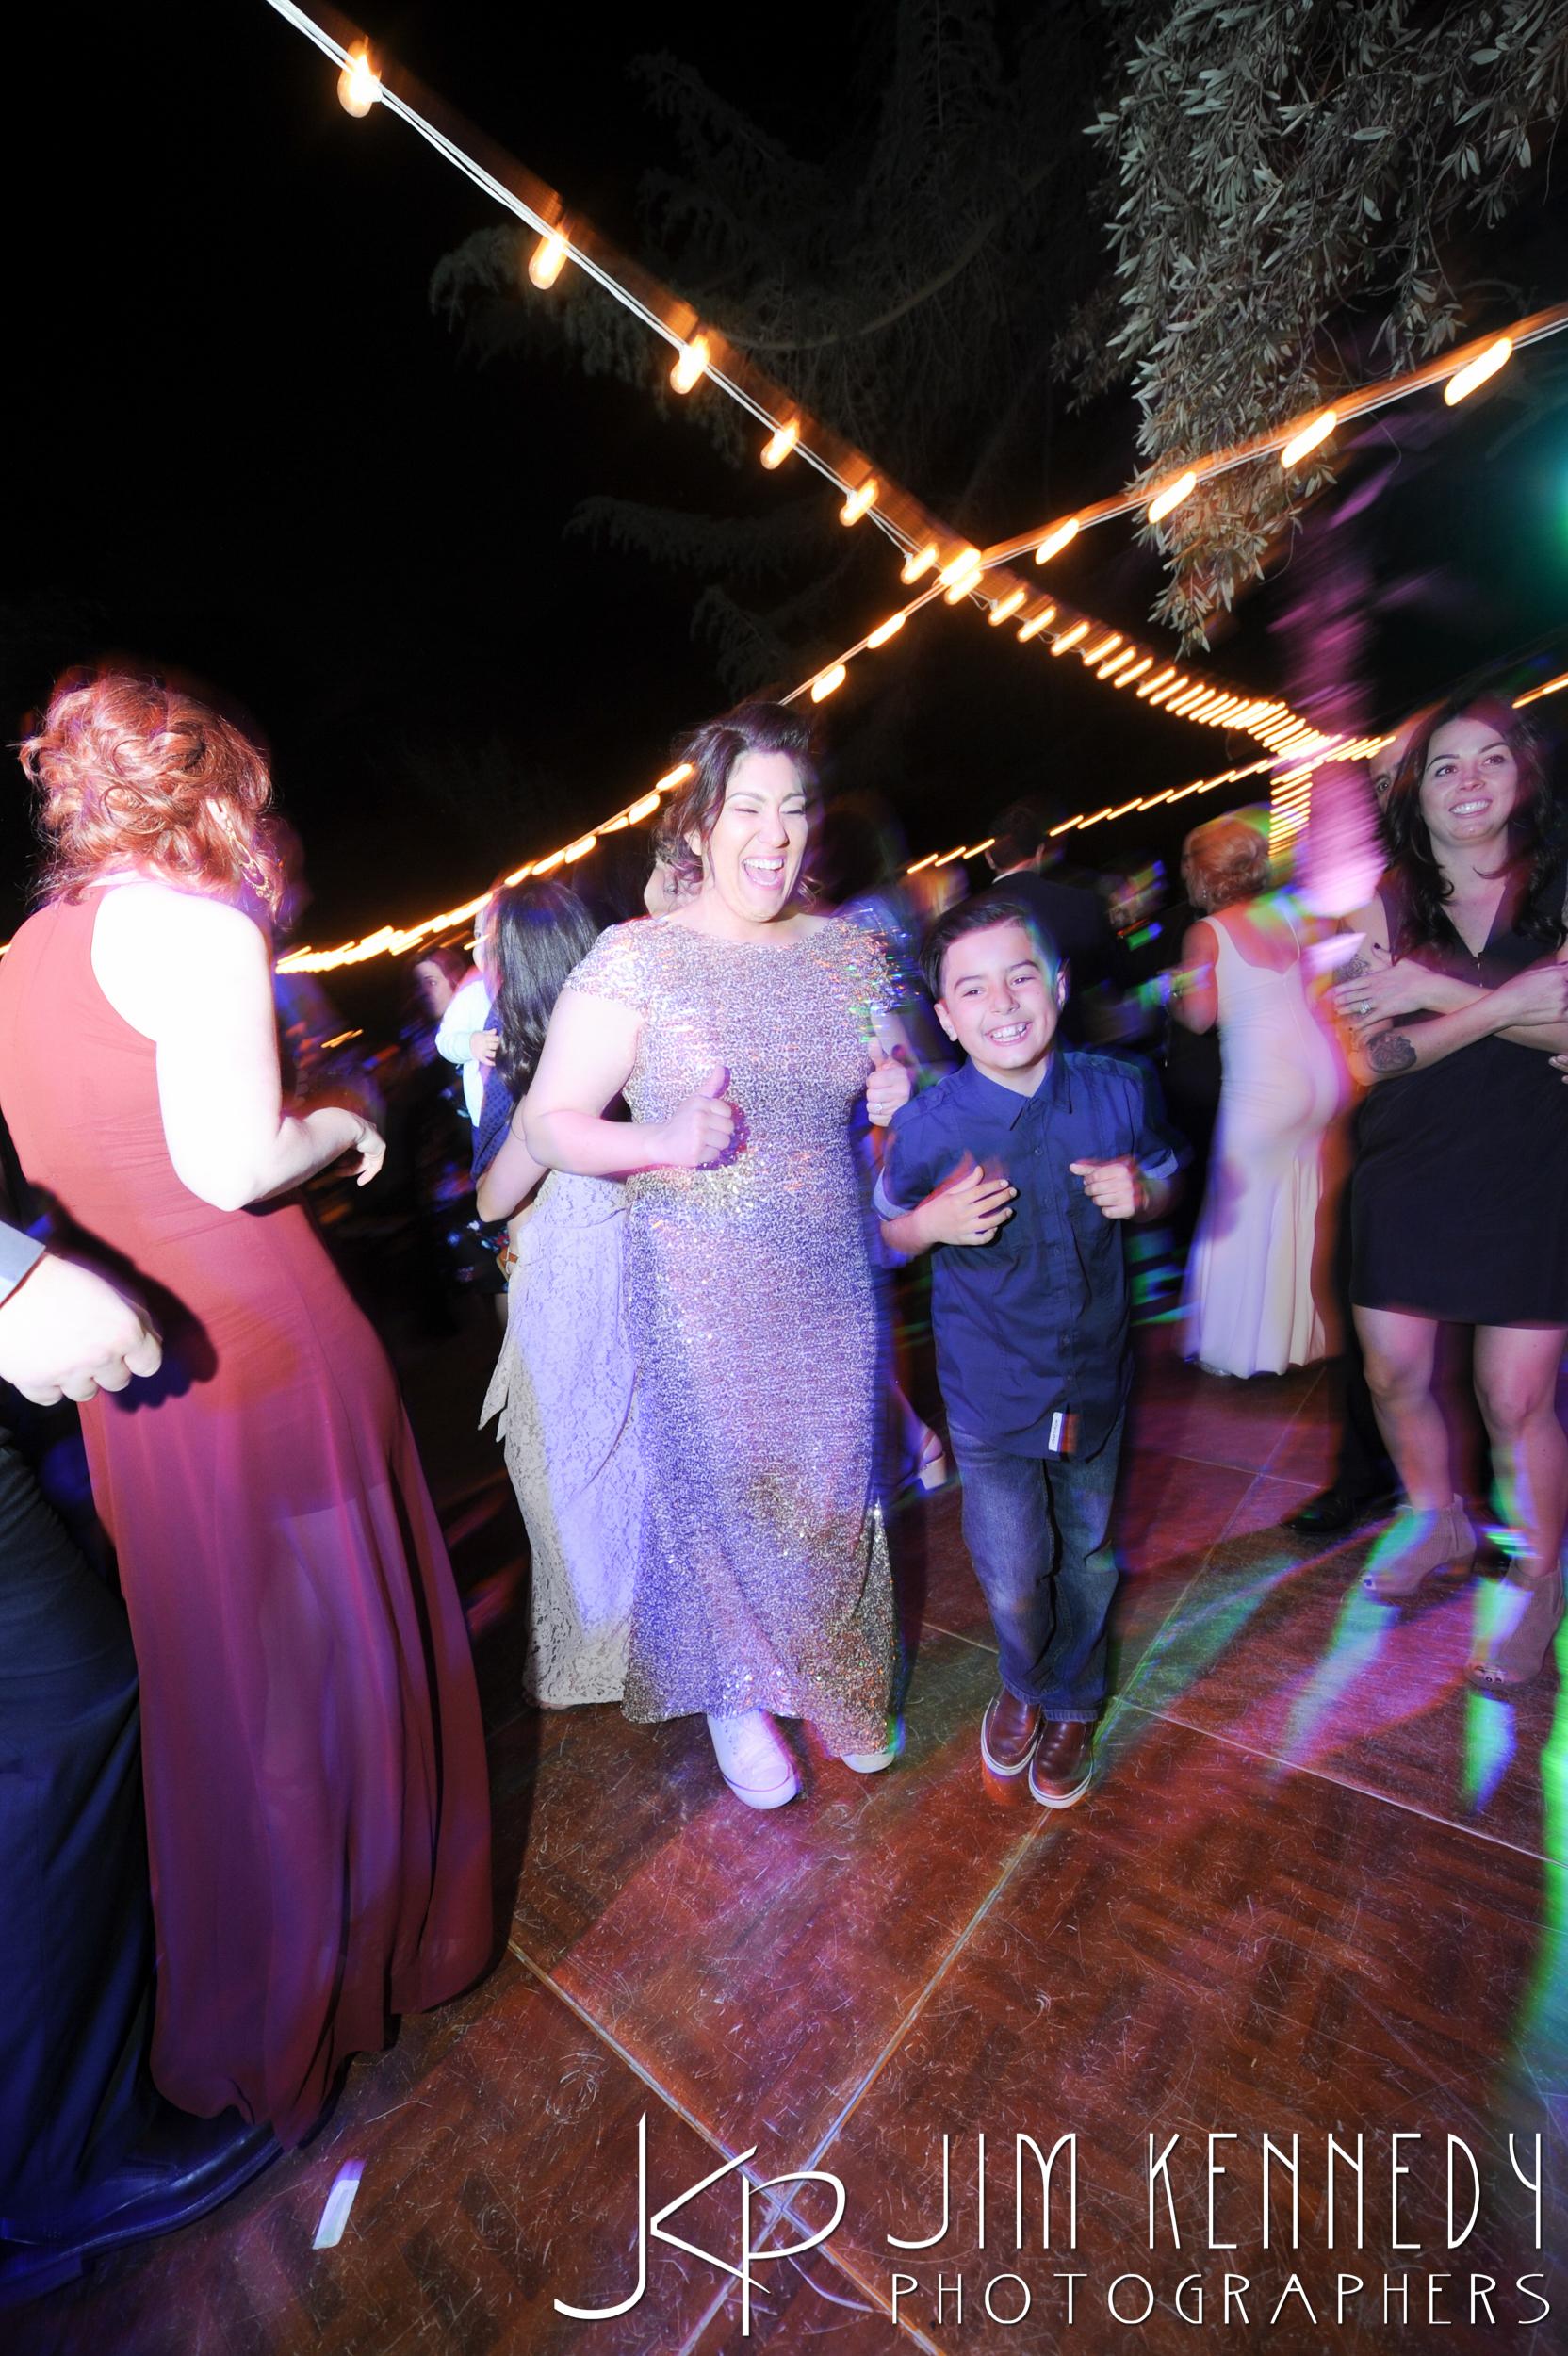 jim_kennedy_photographers_highland_springs_wedding_caitlyn_0209.jpg